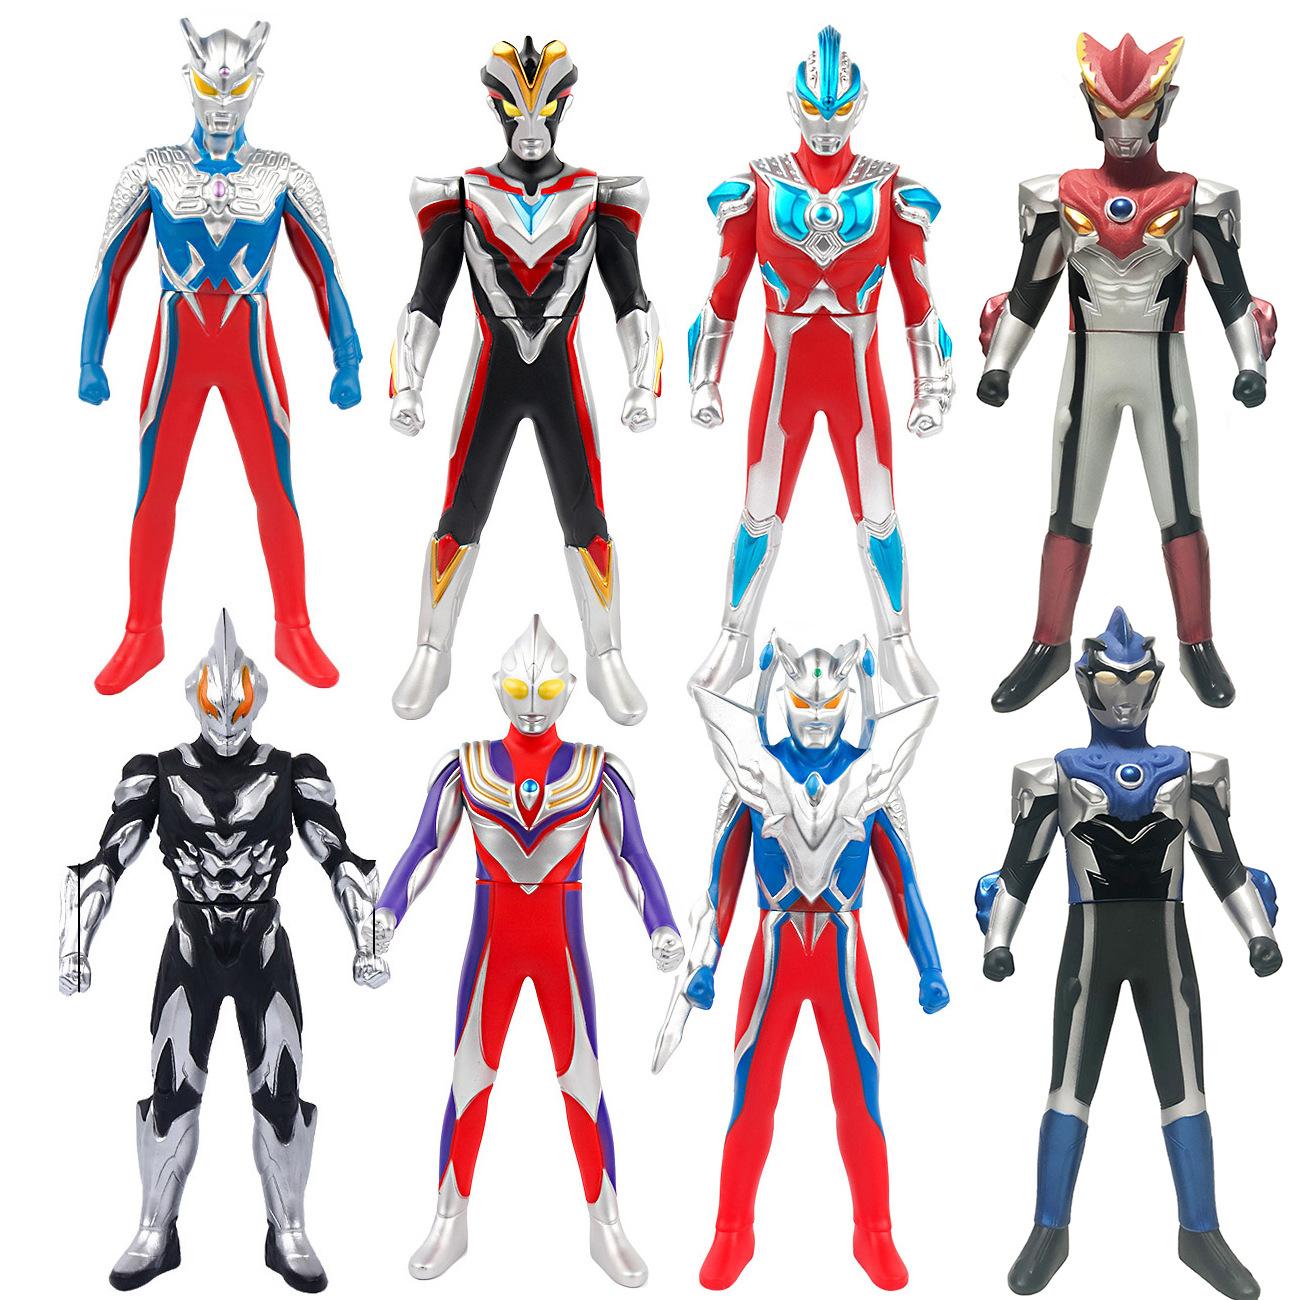 Ultraman игрушки Артикул 593764324514